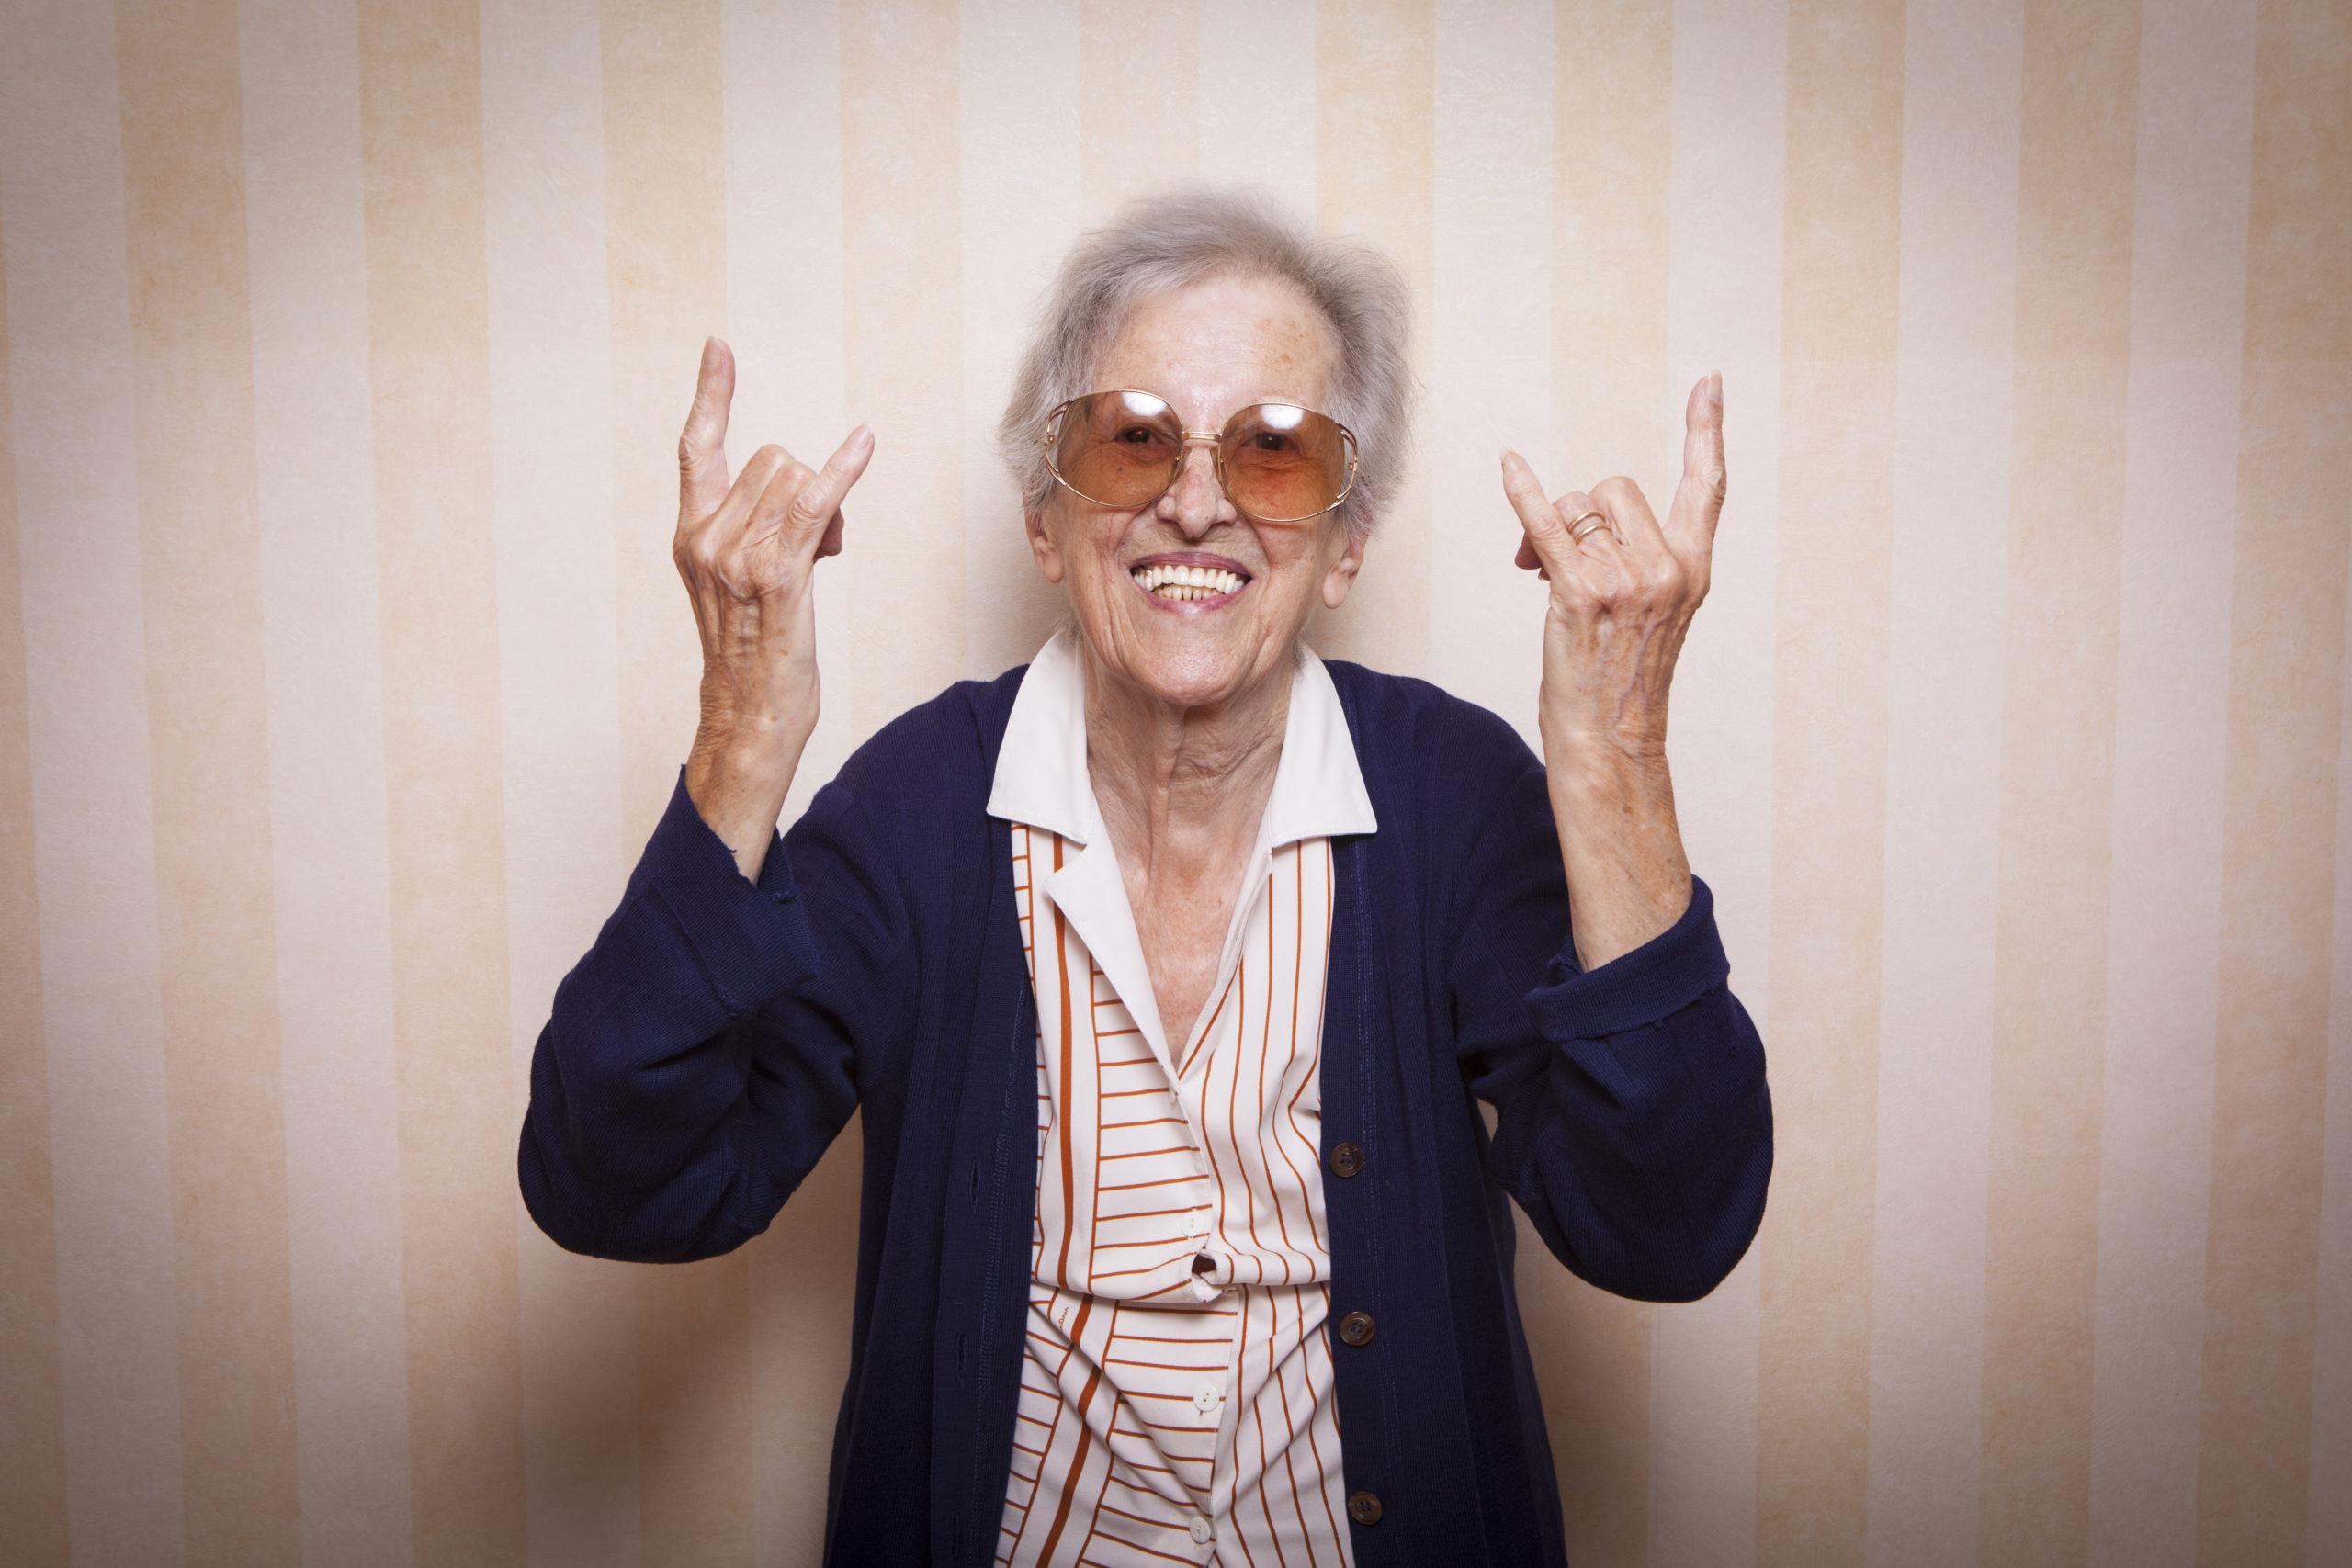 Oma rockt Symbolbild Aufmerksamkeit